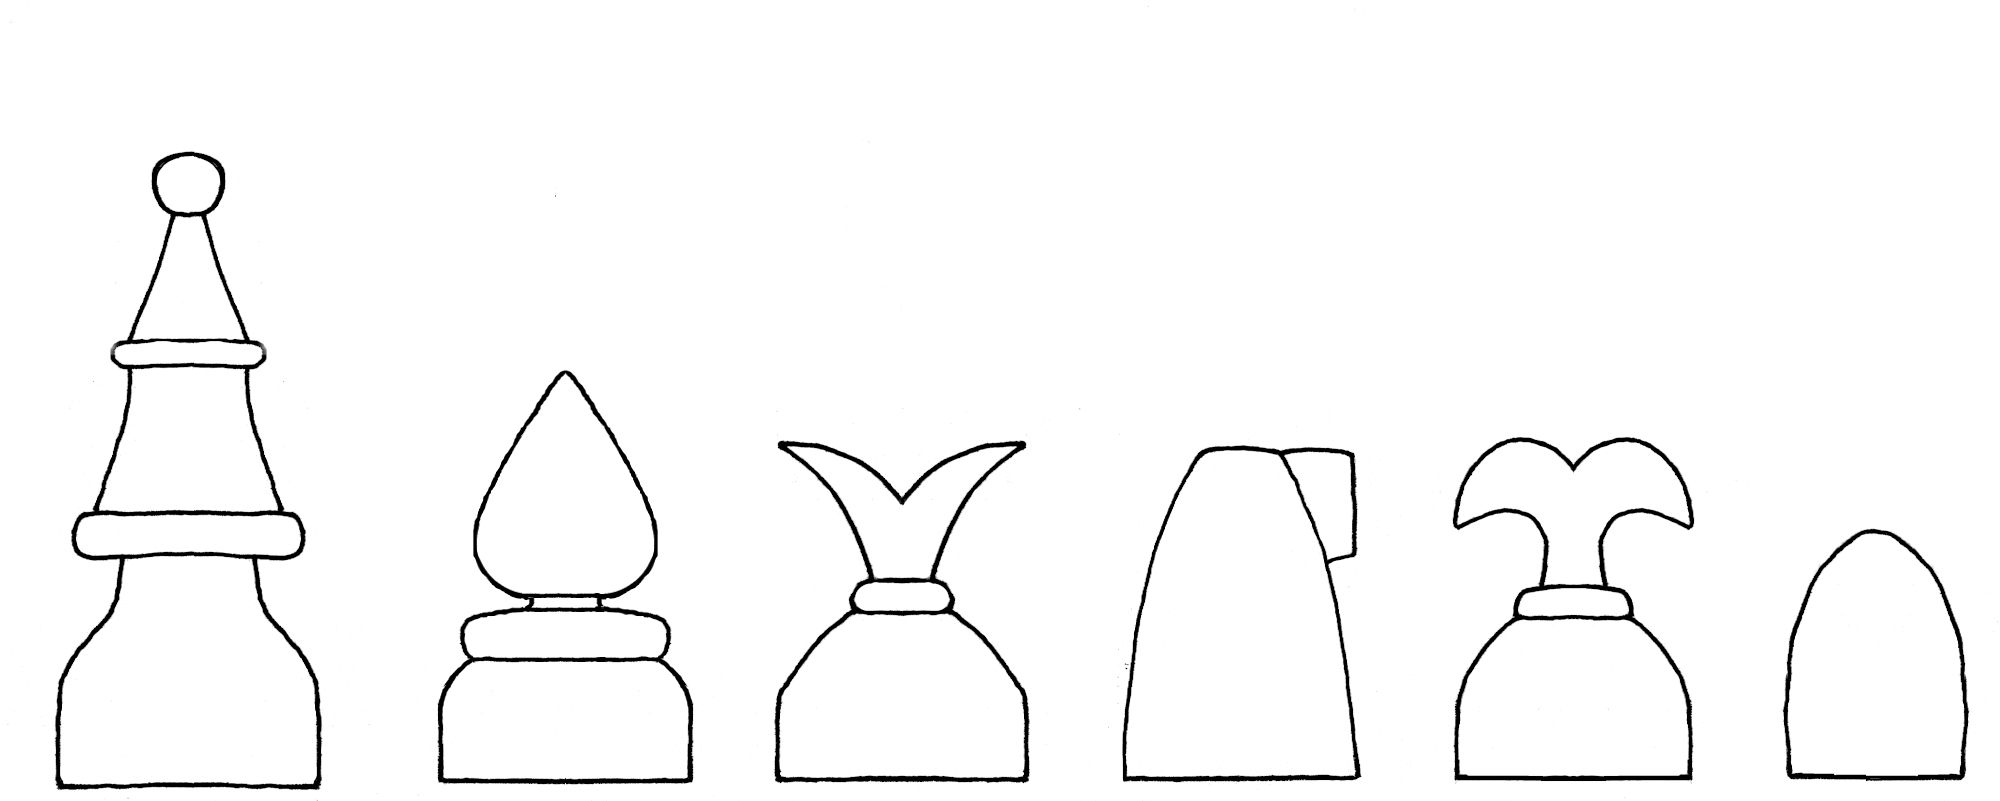 Caxton chess set interpretive diagram